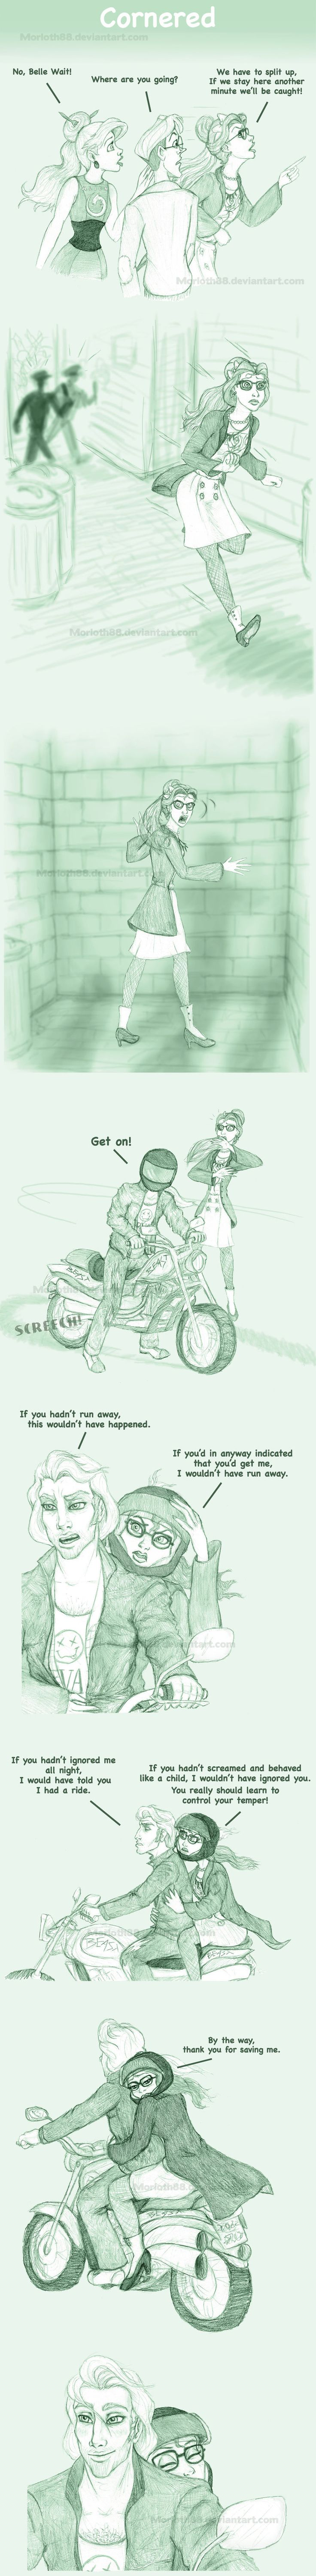 Comic clip #30;Cornered by Morloth88.deviantart.com on @DeviantArt